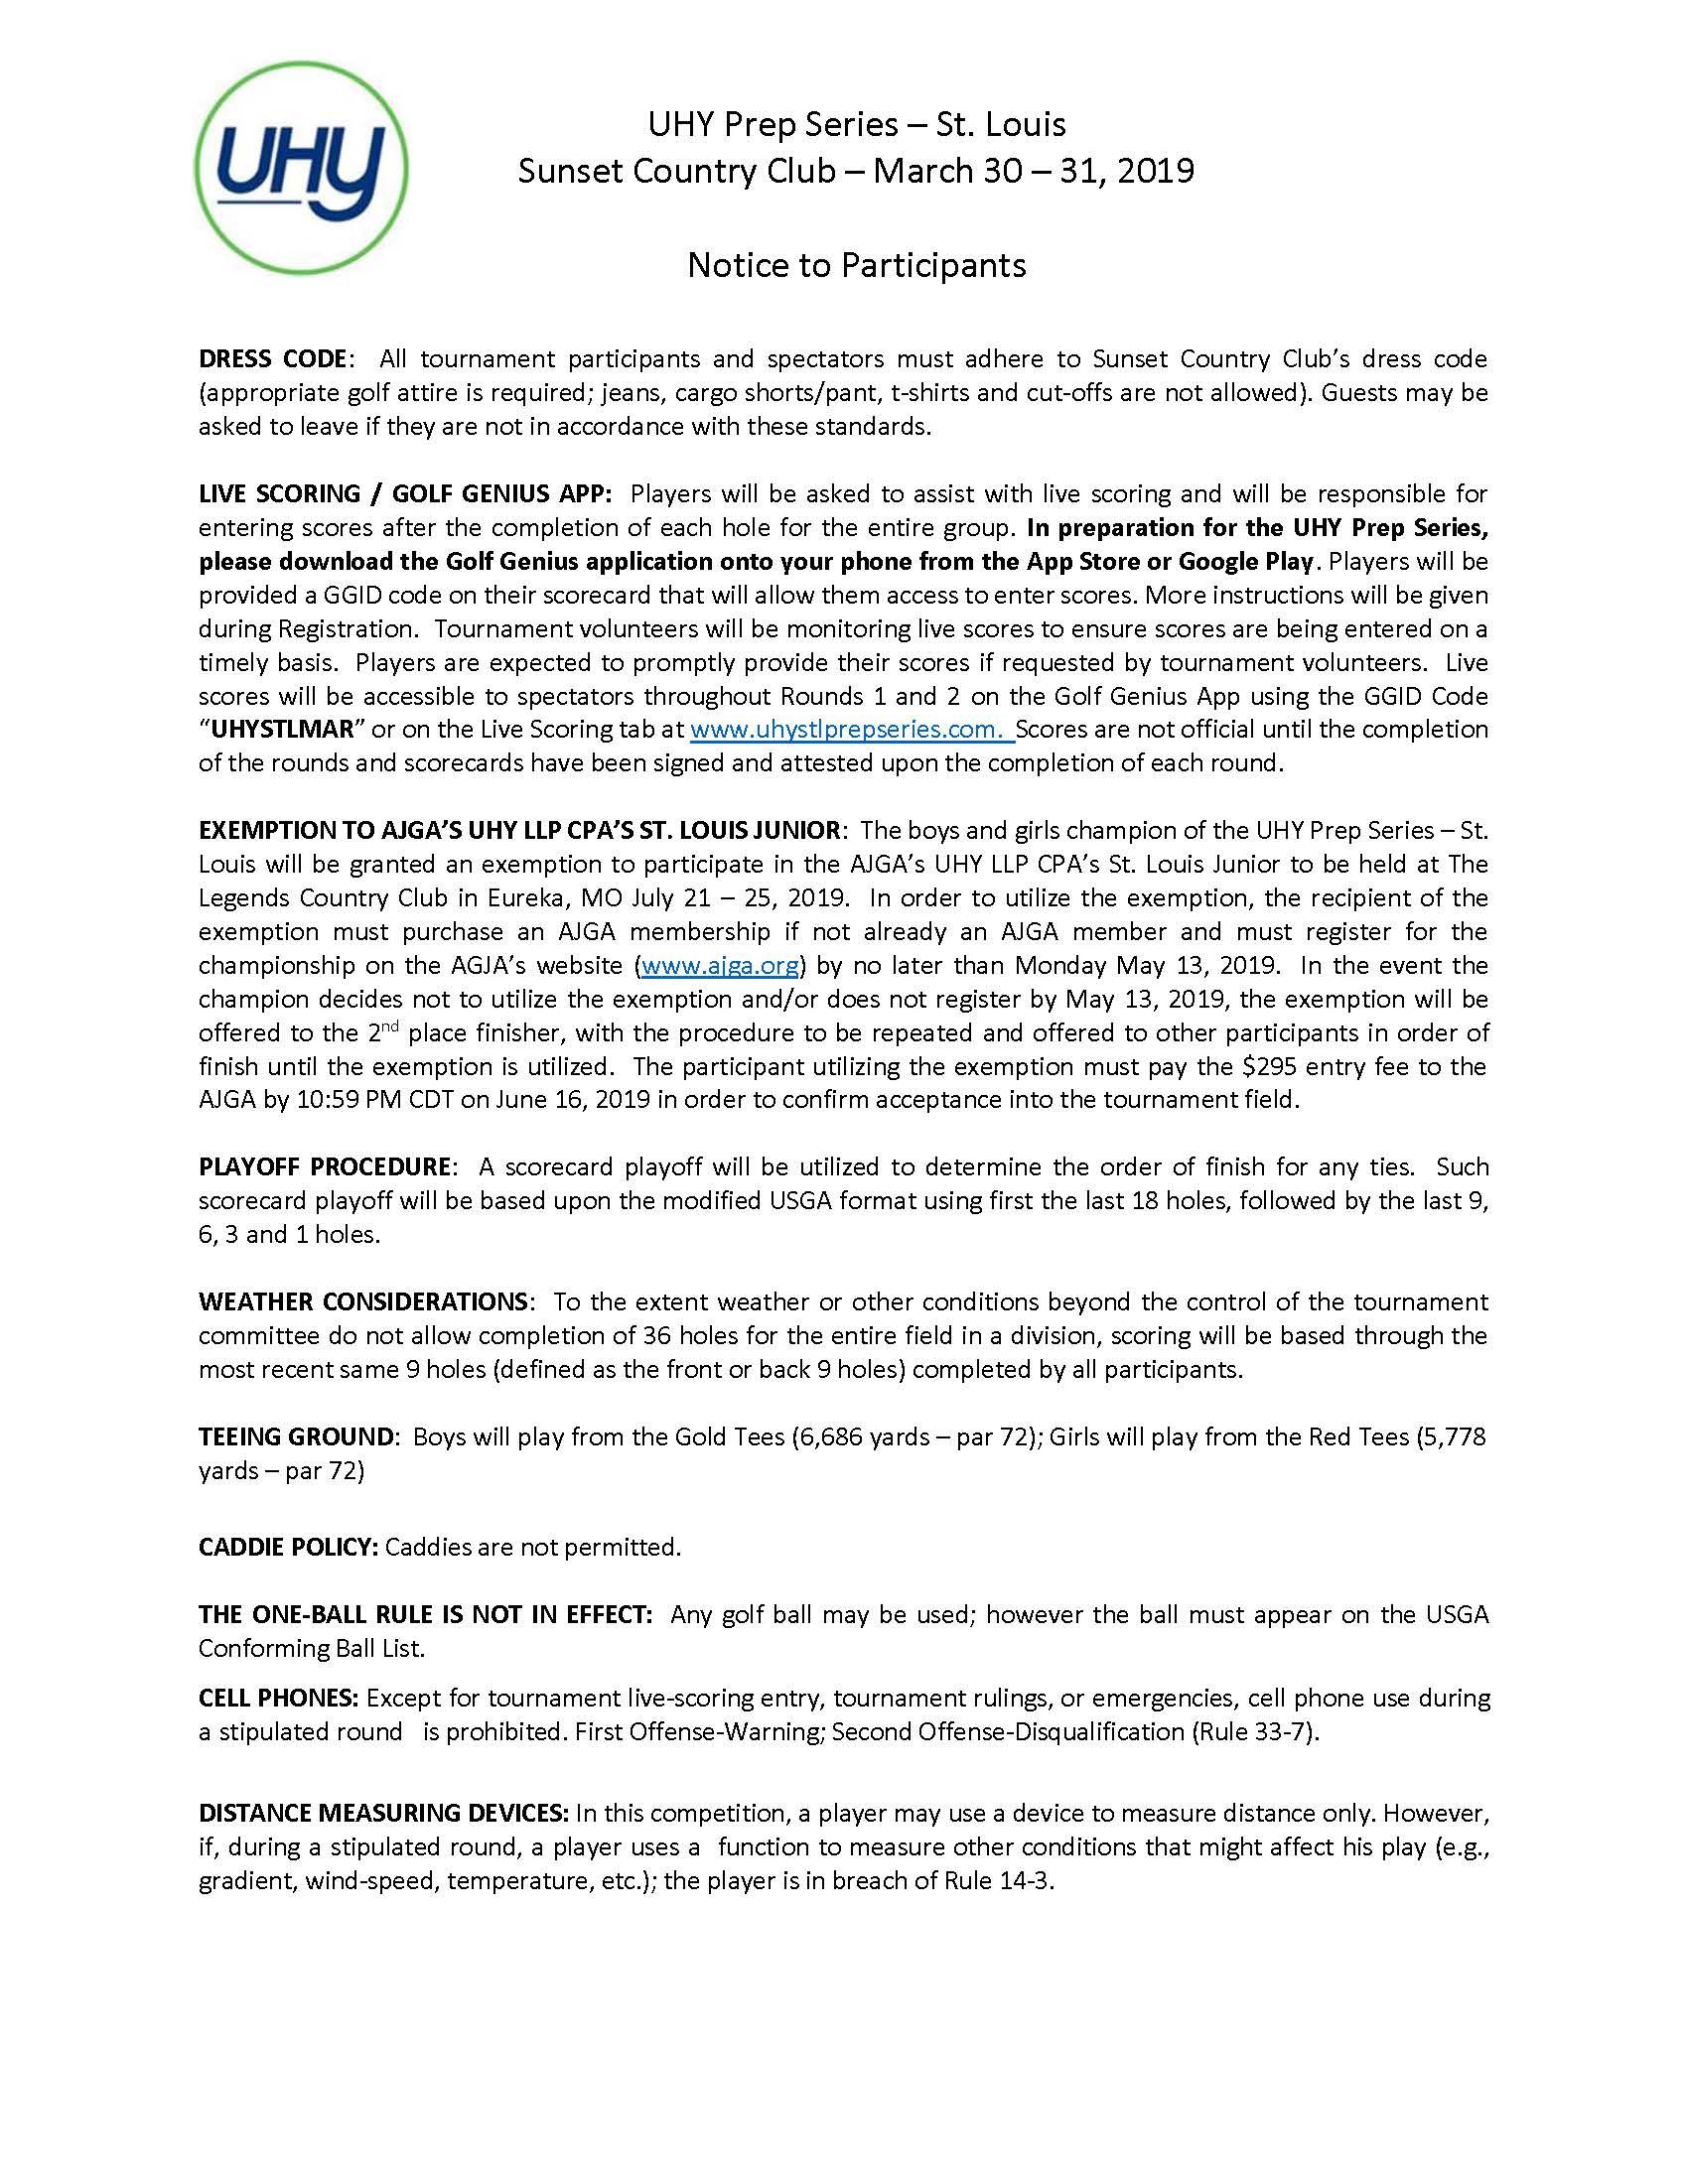 Rules Sheet - UHY LLP CPA's Prep Series - STL (MAR 30 - 31 2019)_Page_1.jpg